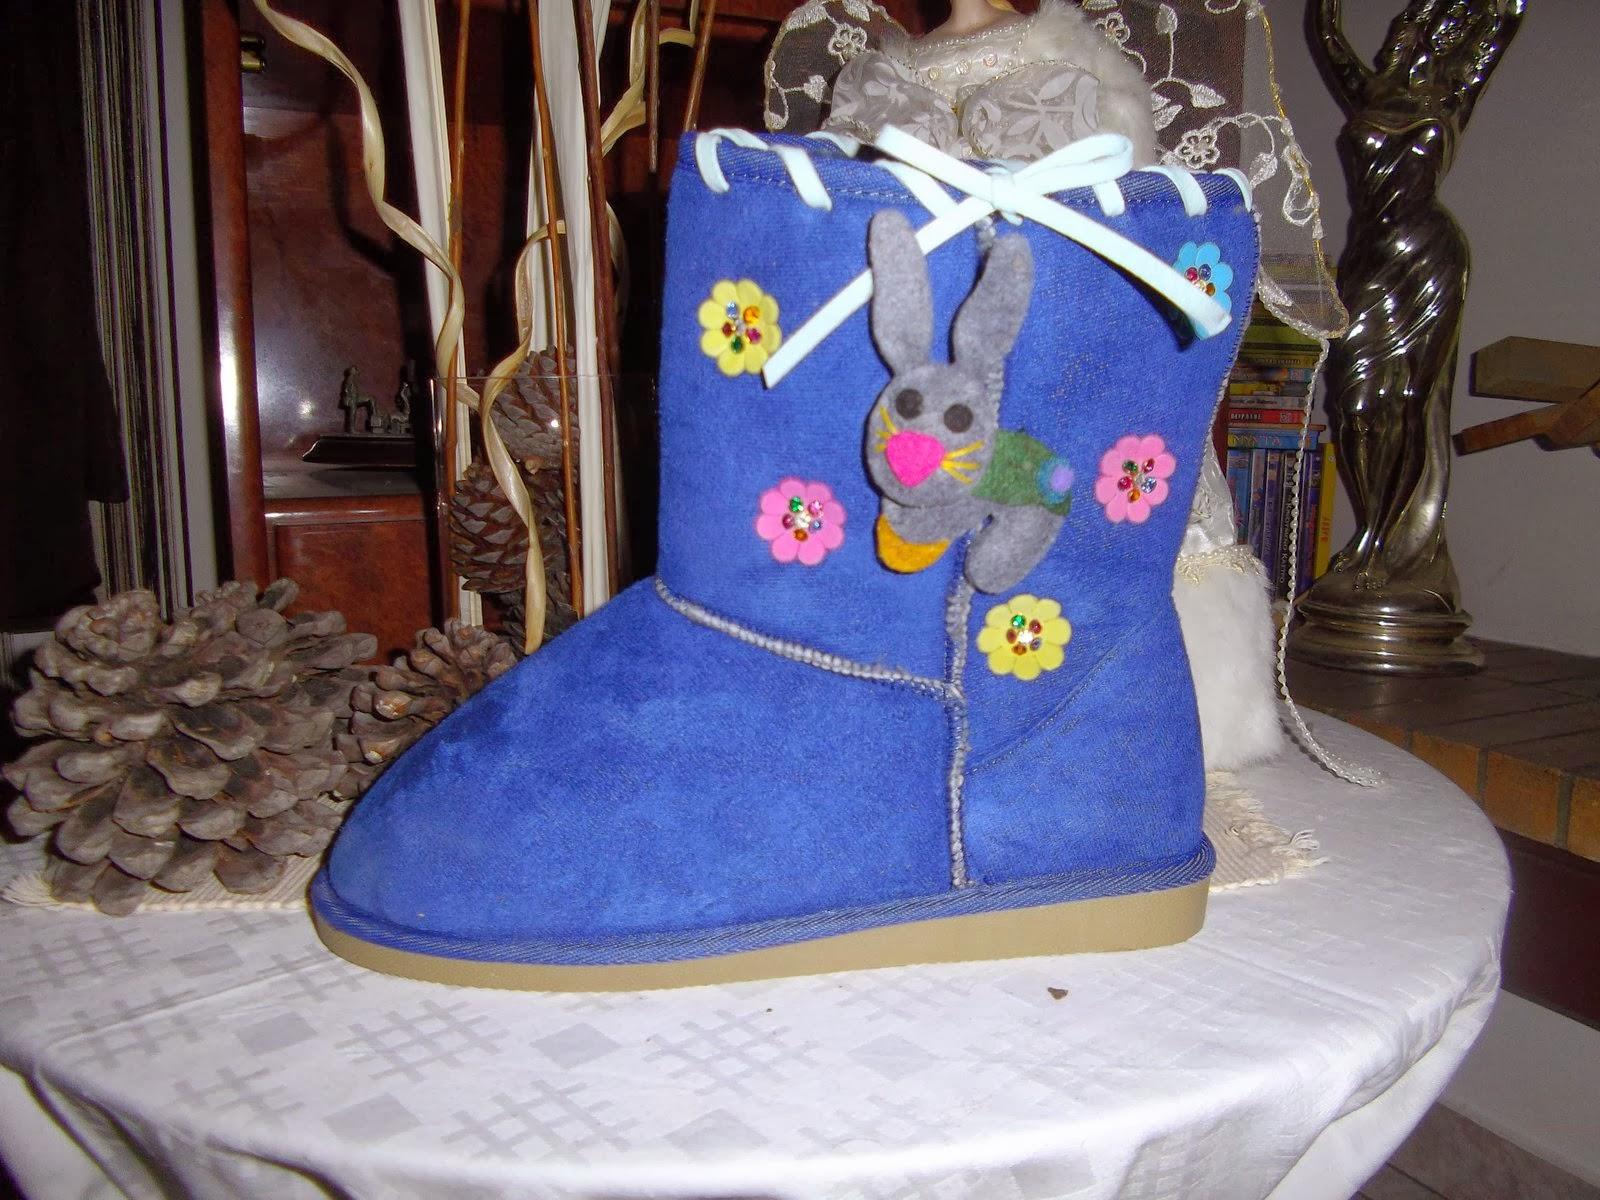 74ccaf5470a Παιδικές μπότες τύπου Ugg, διακοσμημένες με πολύ κέφι και χαρούμενη διάθεση!